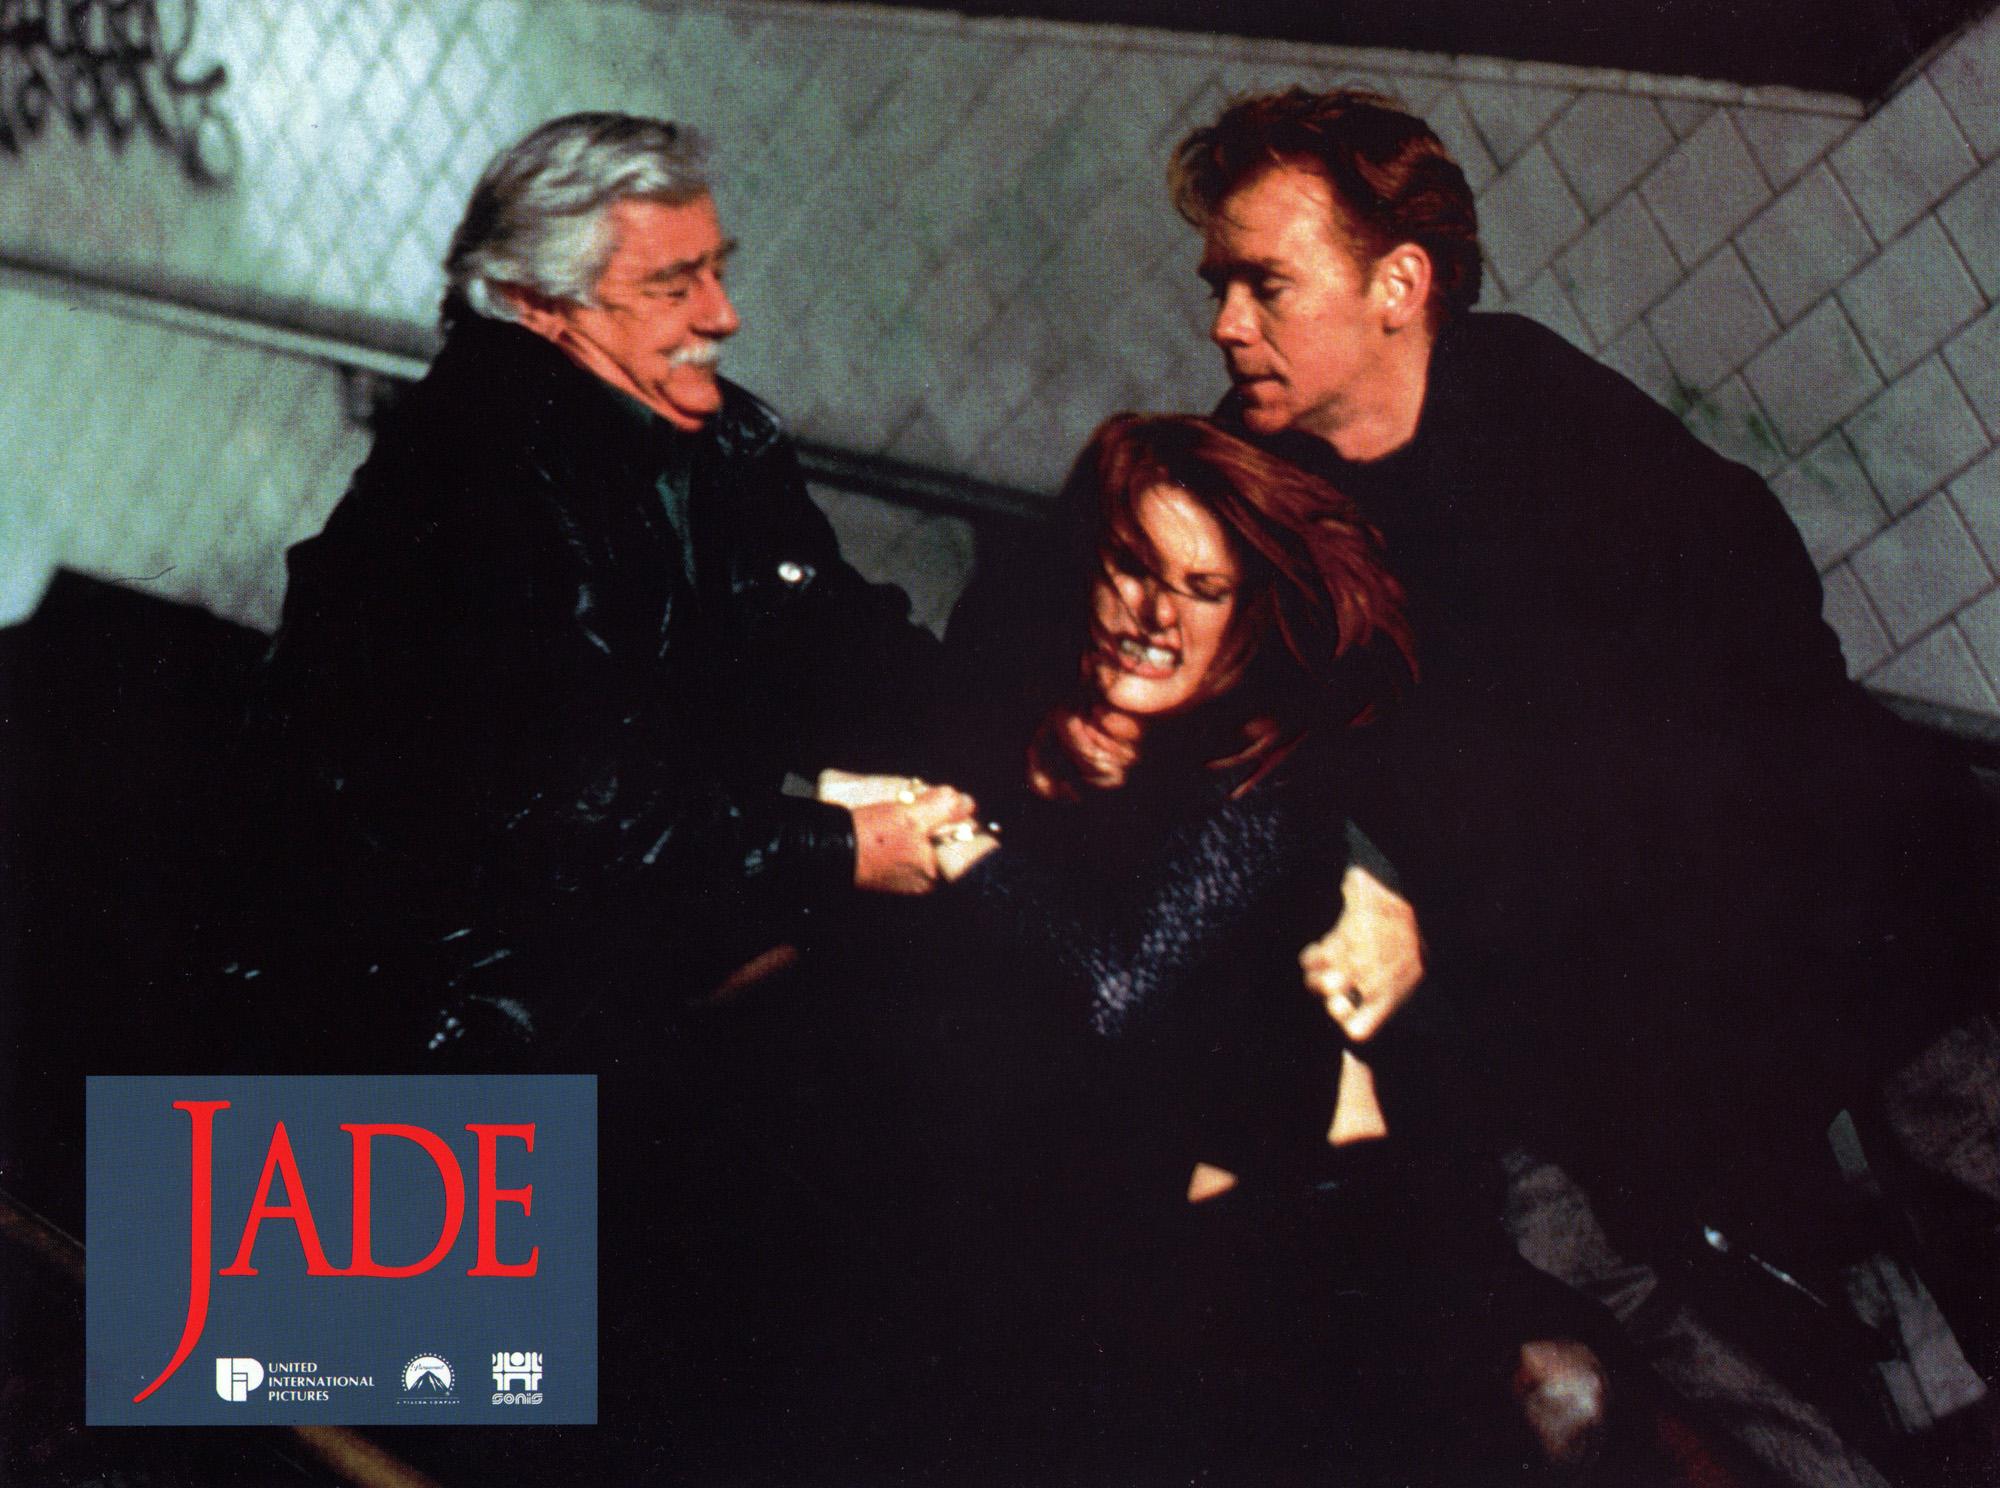 jade-france-06